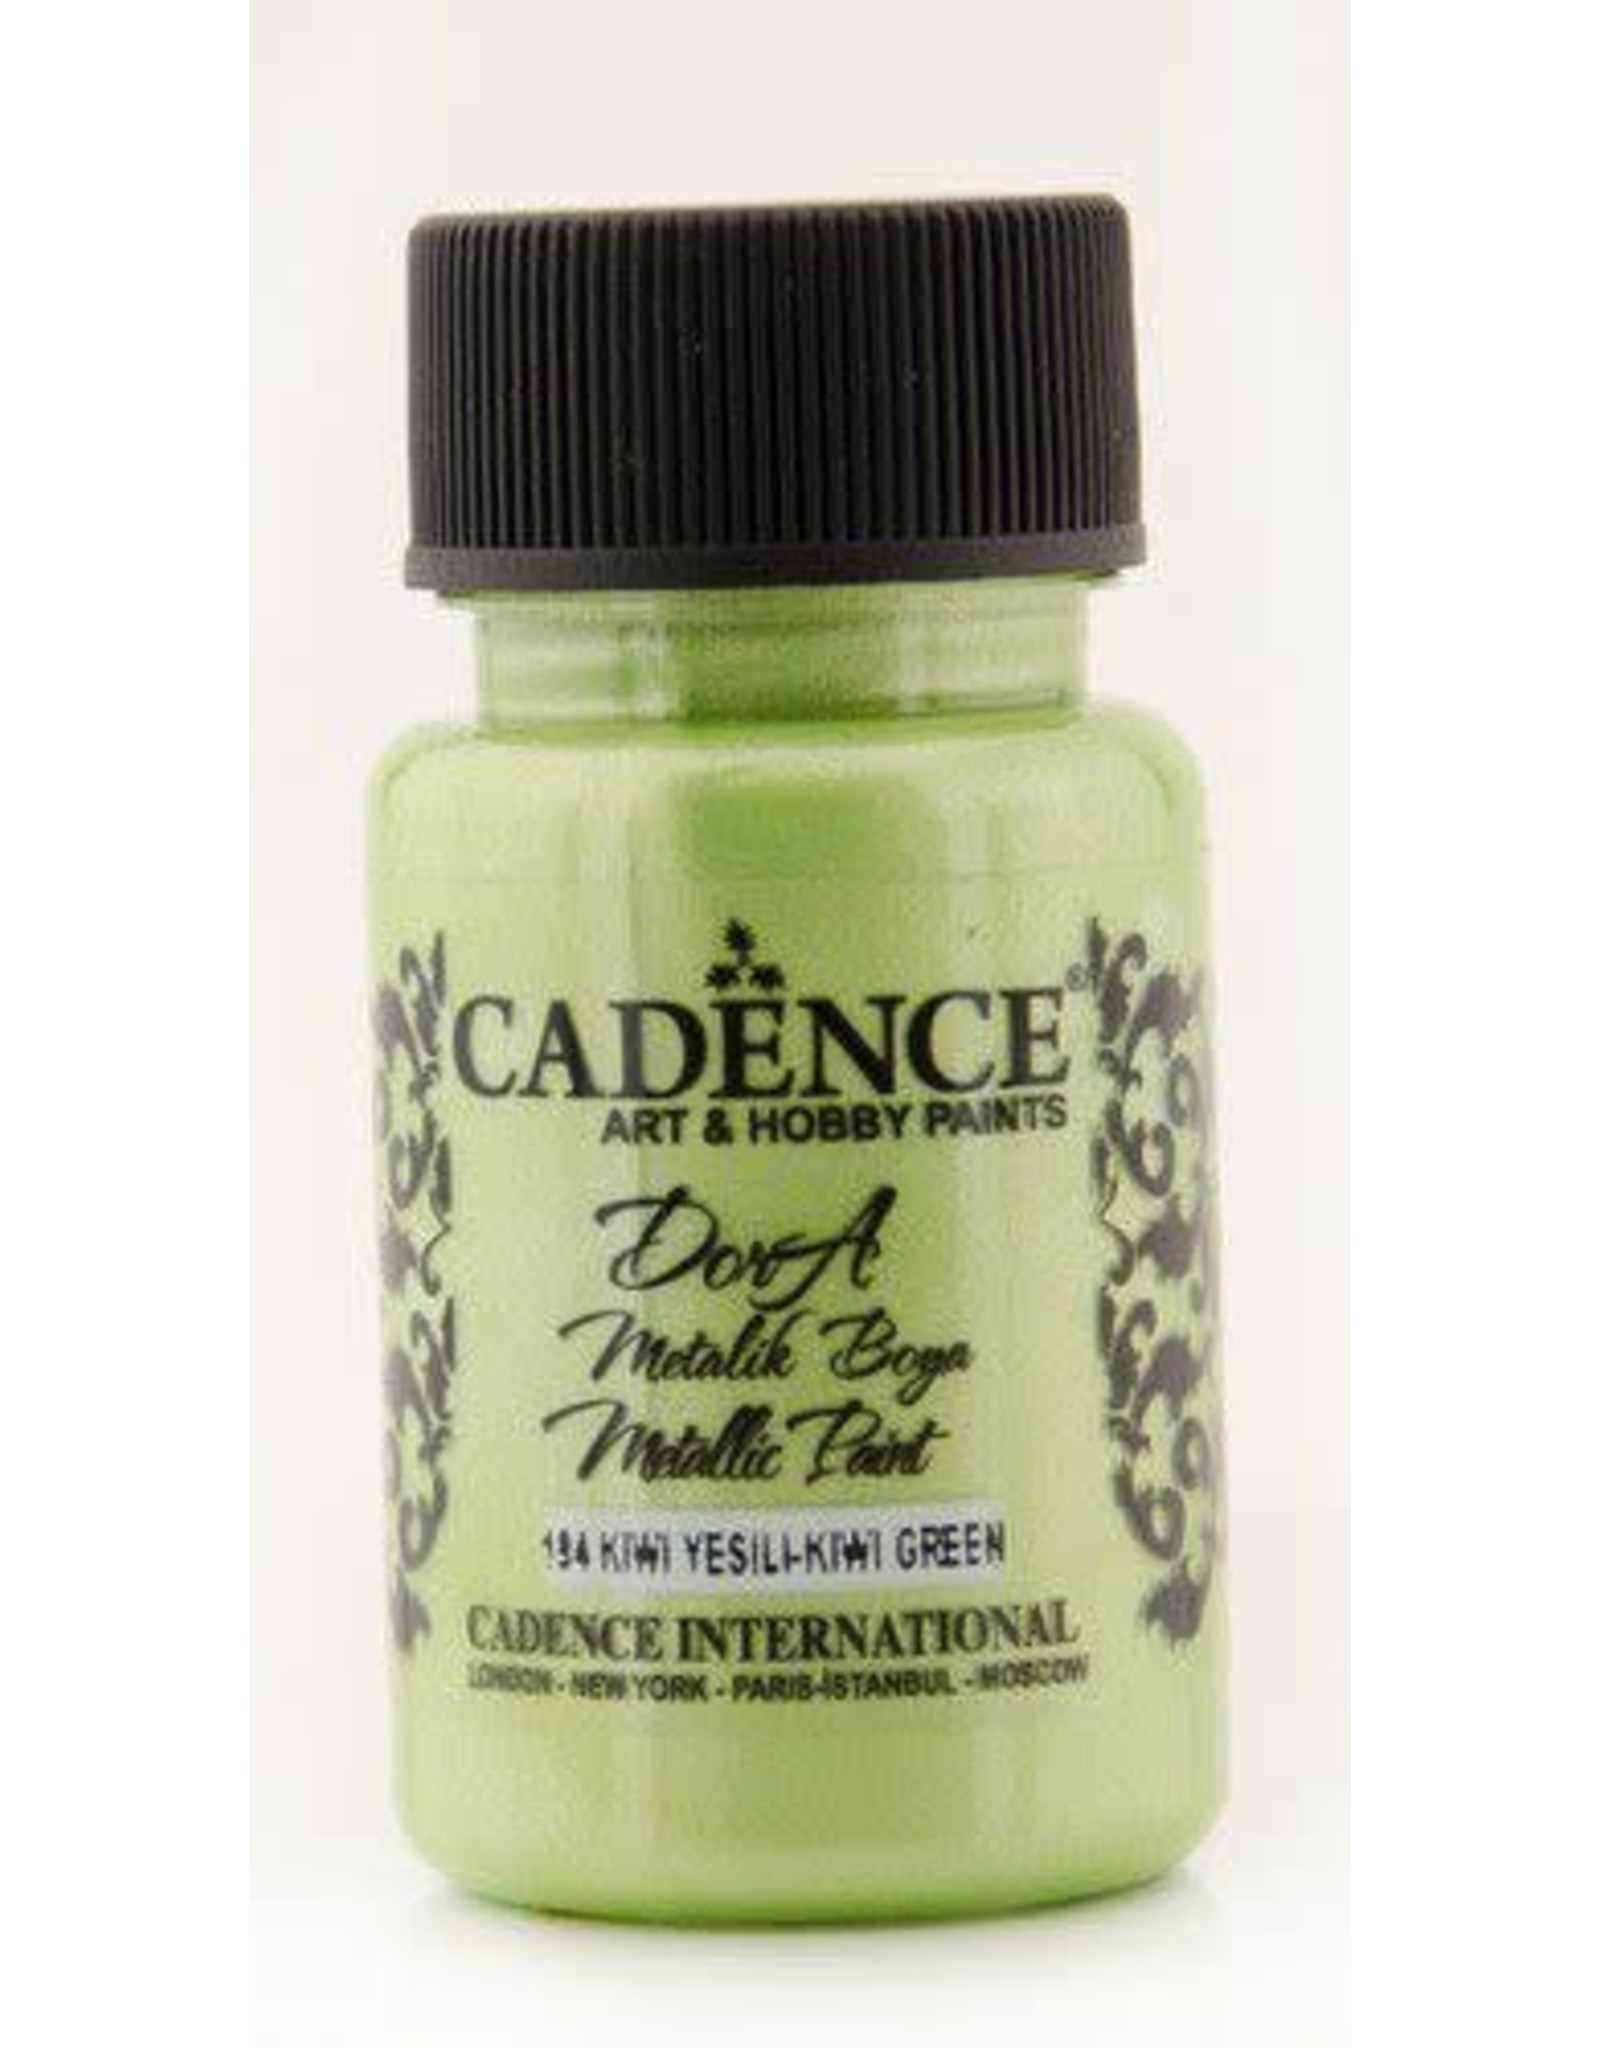 Cadence Cadence Dora metallic verf Kiwi groen